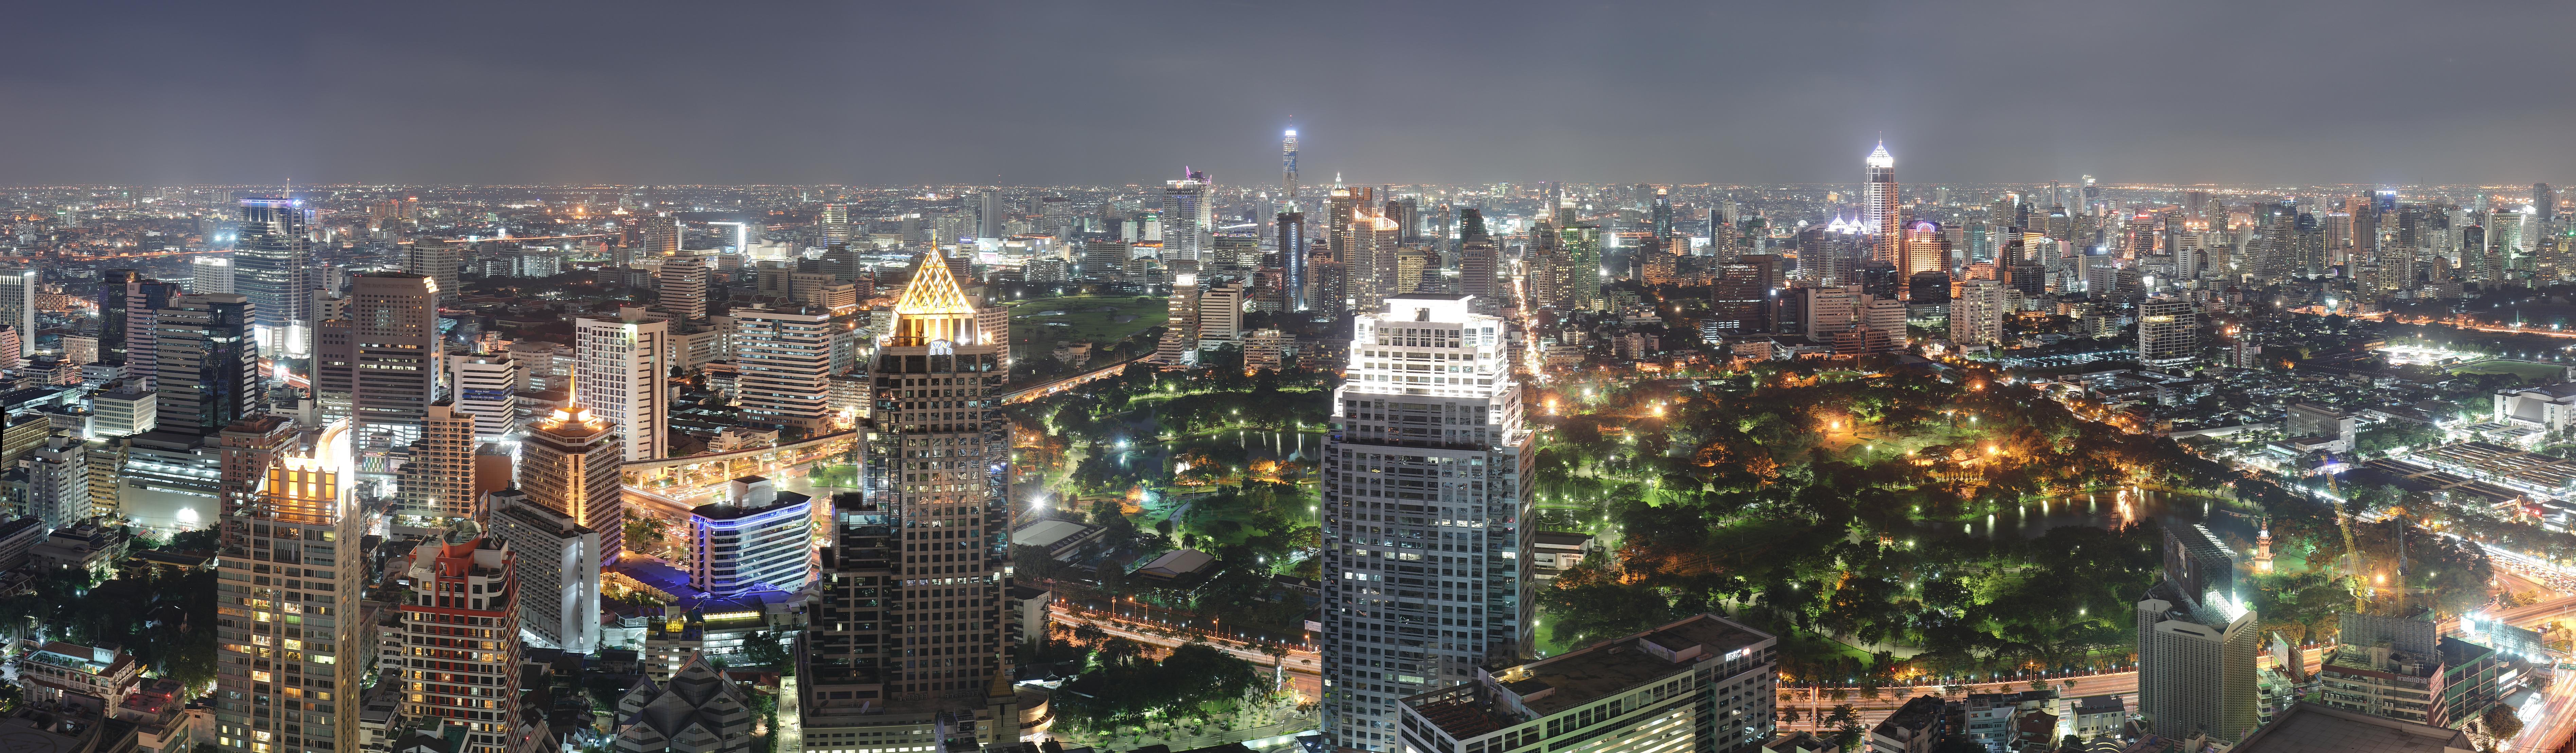 Öine Bangkok (foto: Wikimedia Commons)